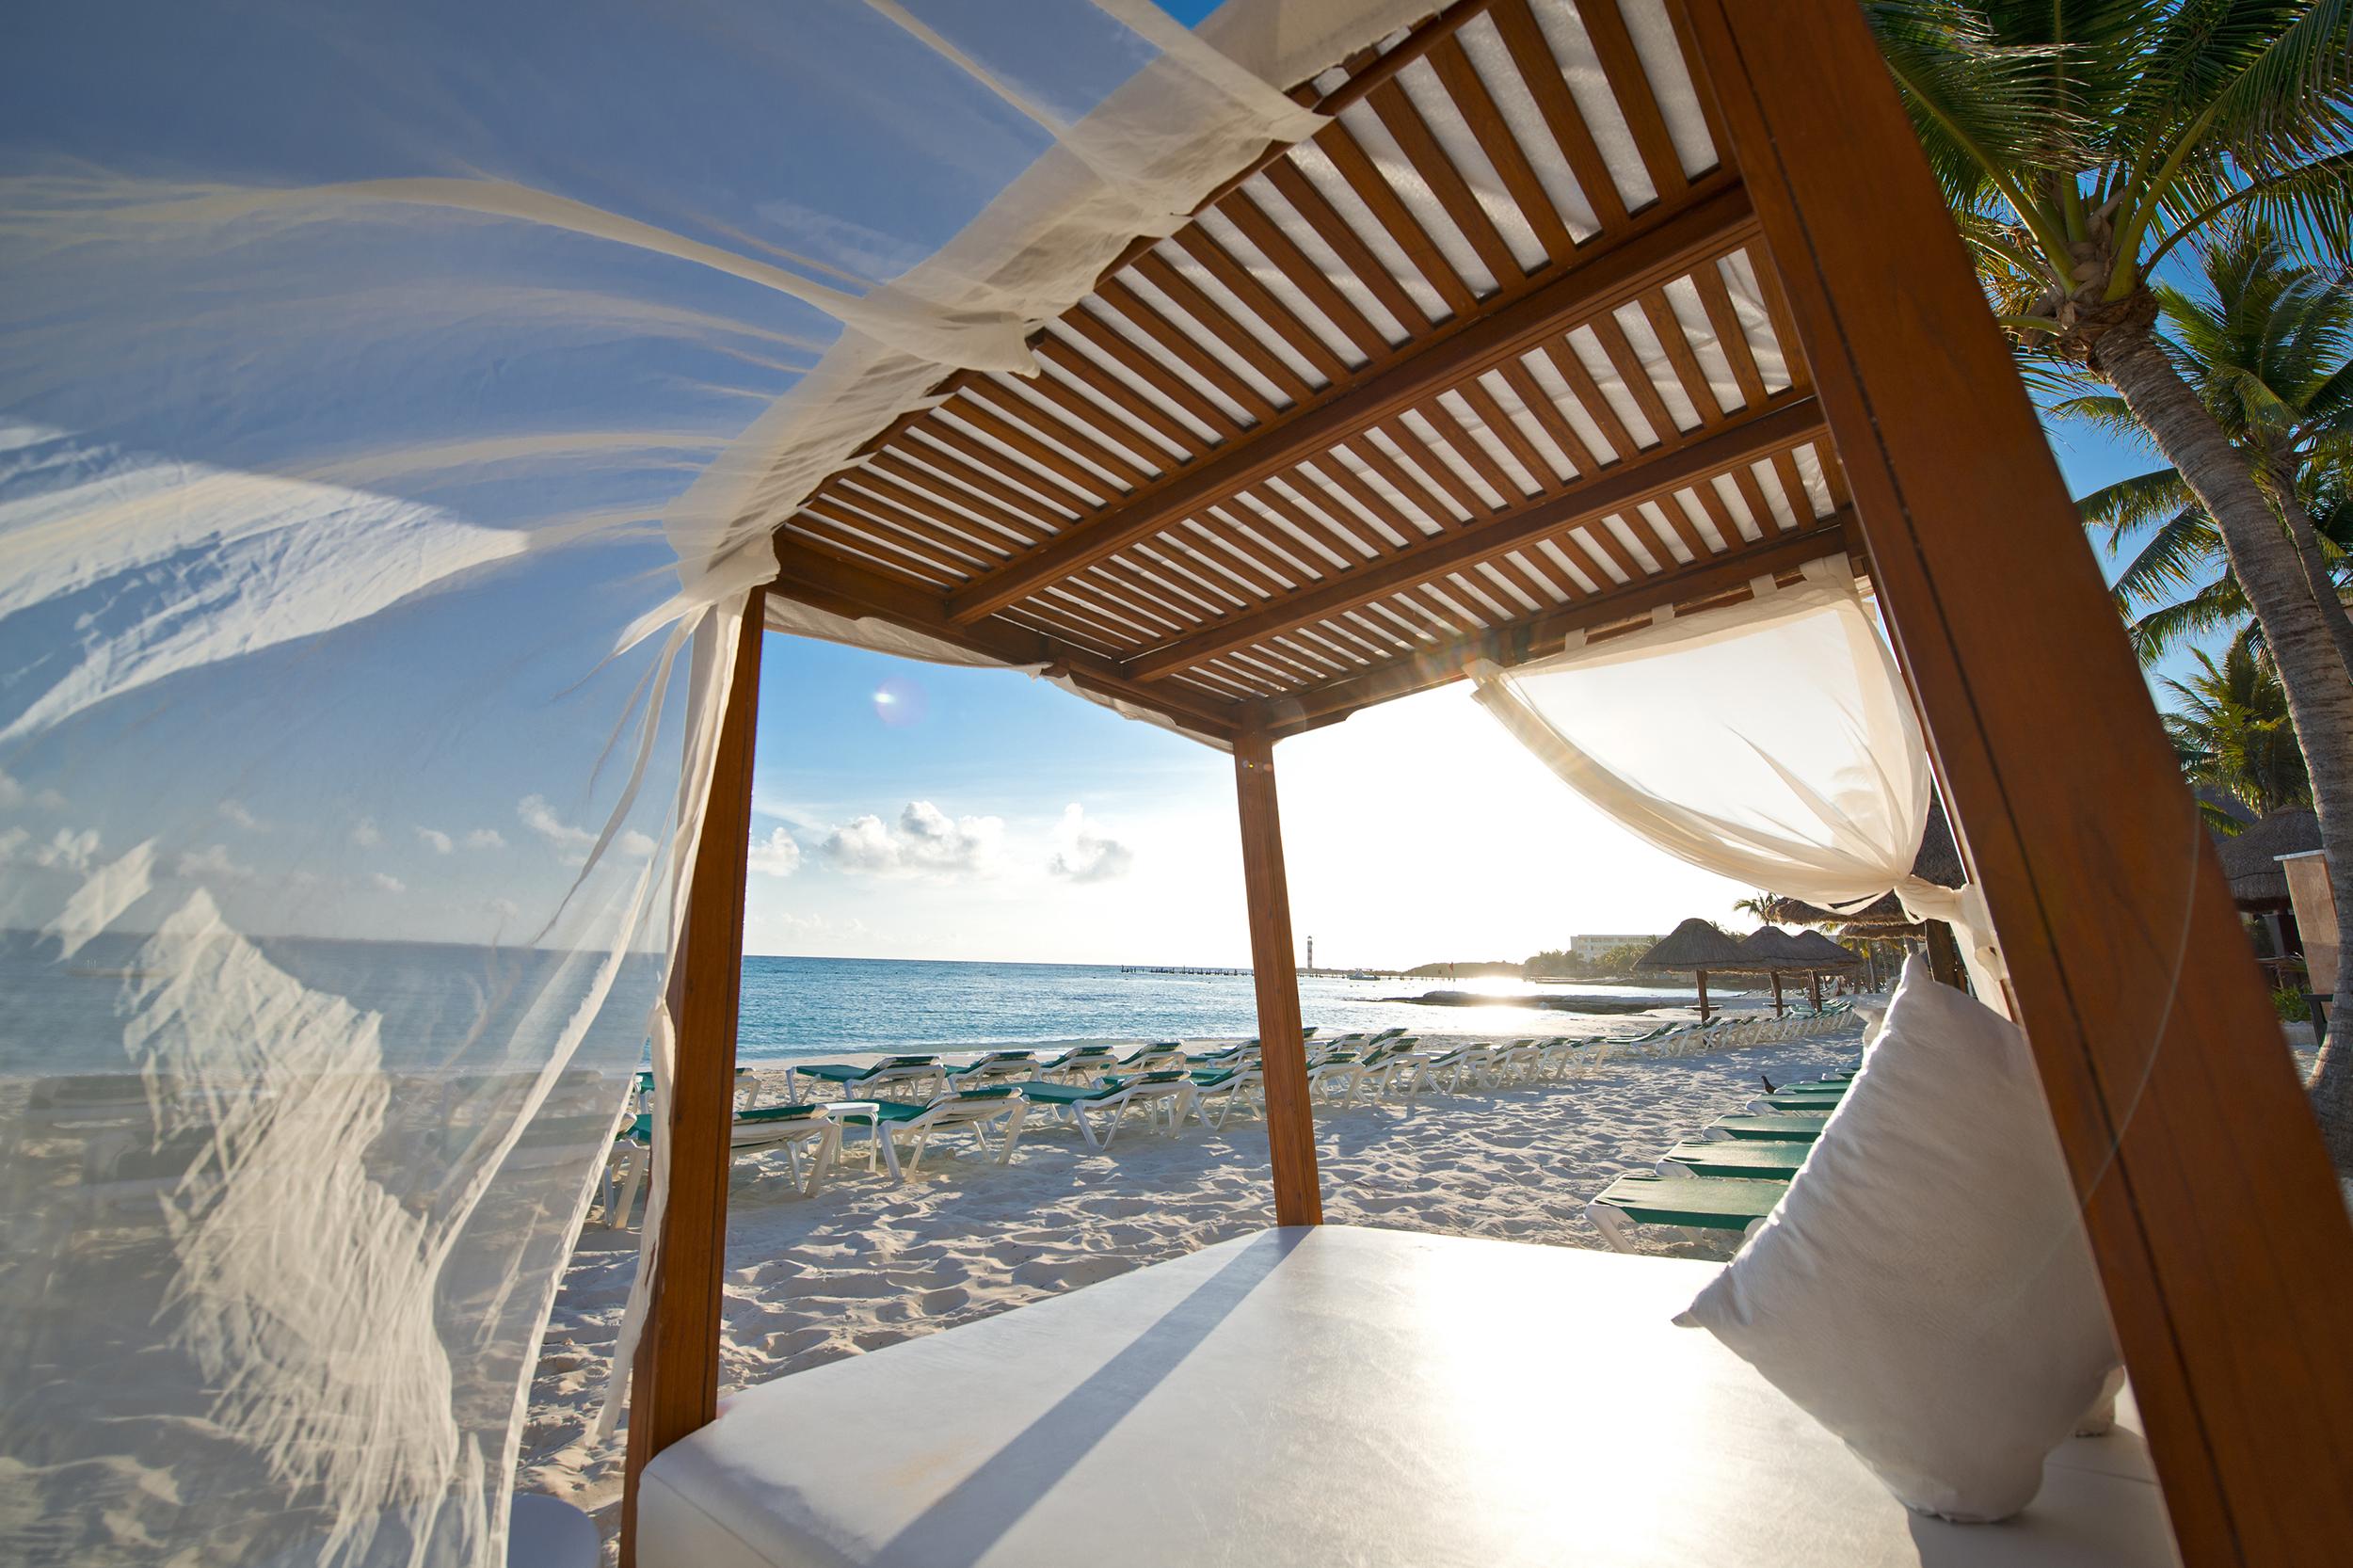 beach cabana in Mexico